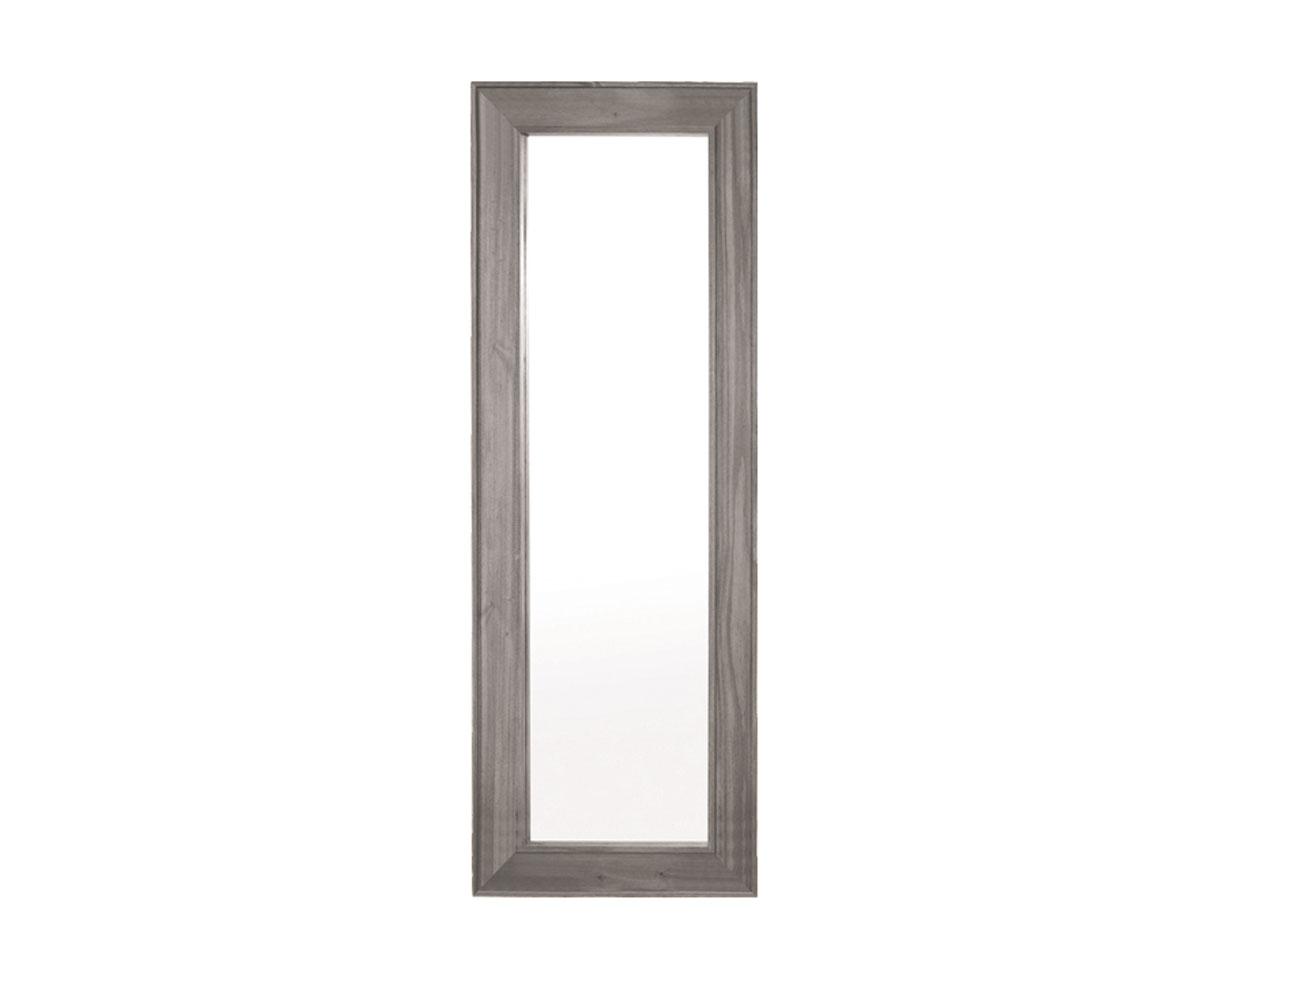 1920302 marco espejo vestidor jalisco madera 90 170